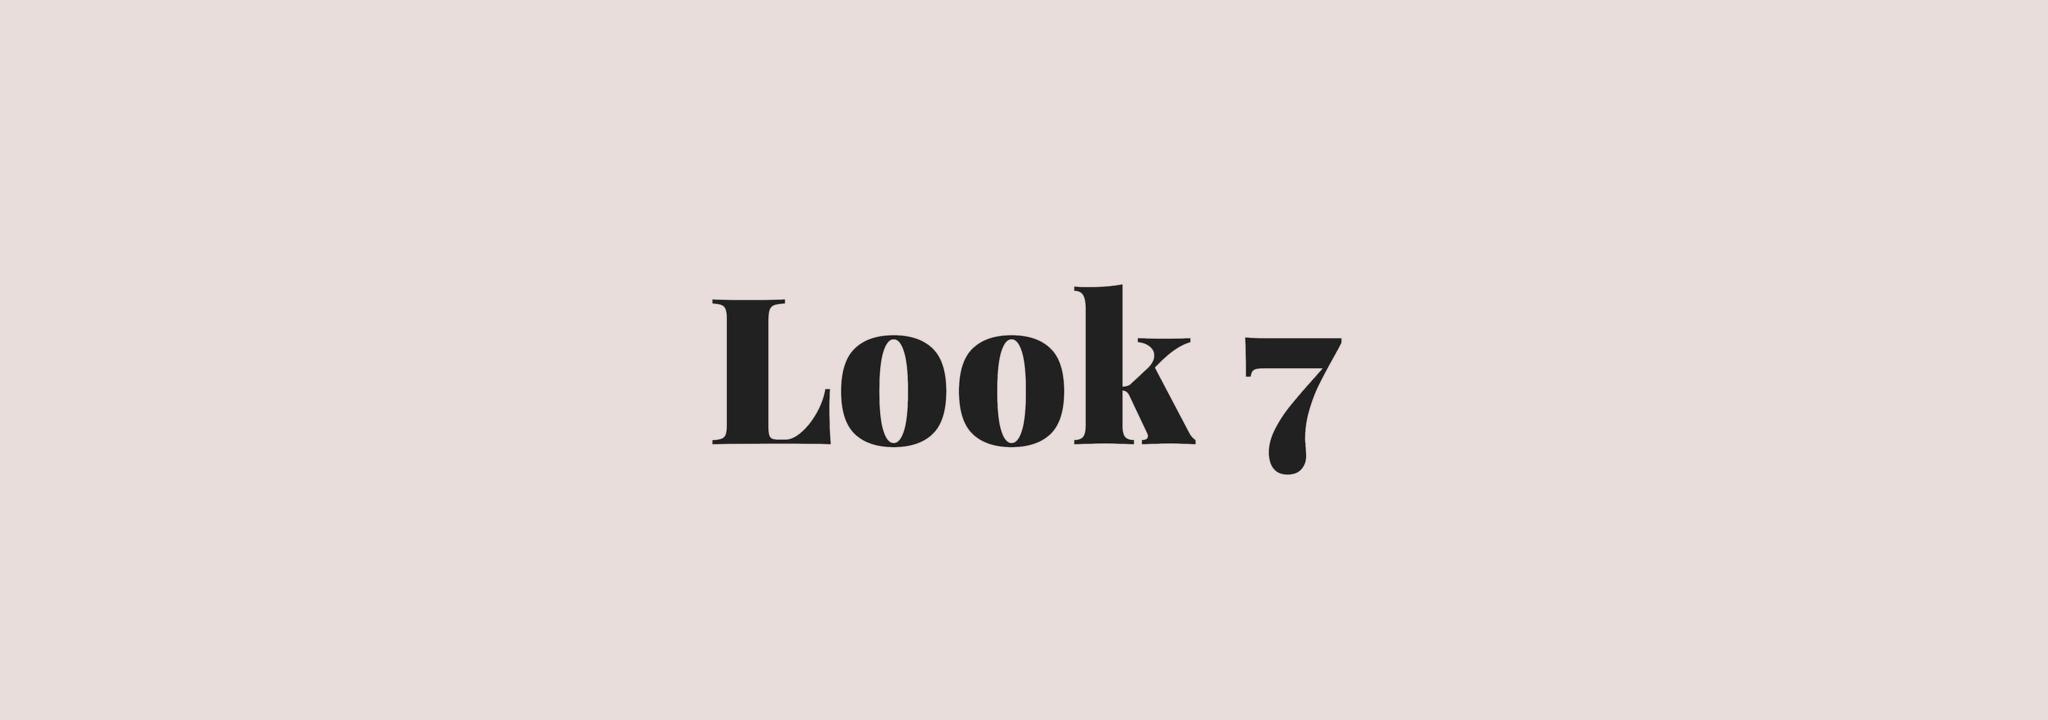 look 7